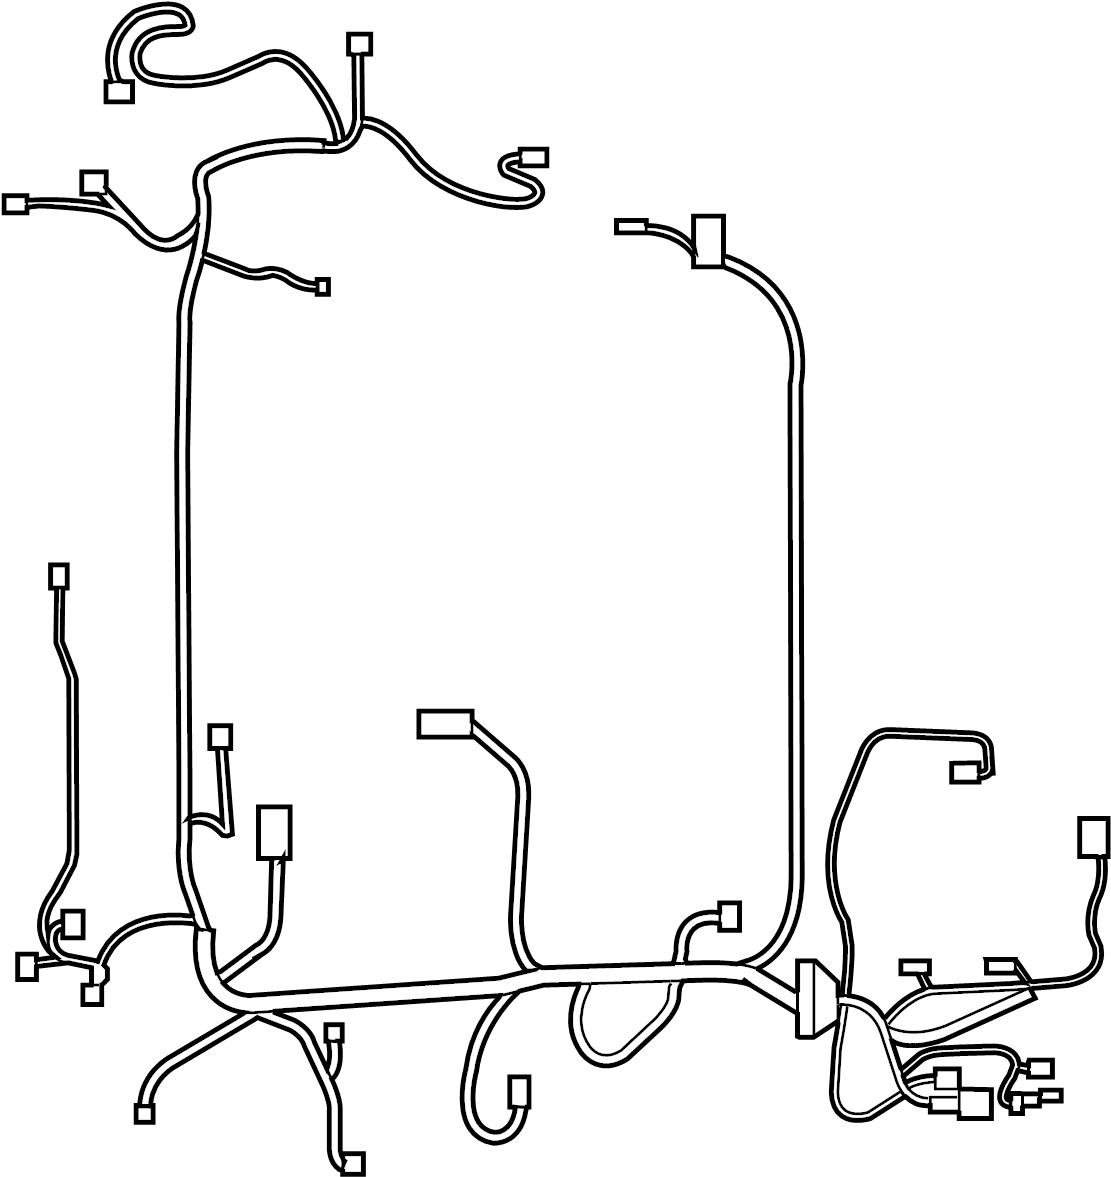 Nissan Sentra Engine Wiring Harness. BODY, CVT, ROOM